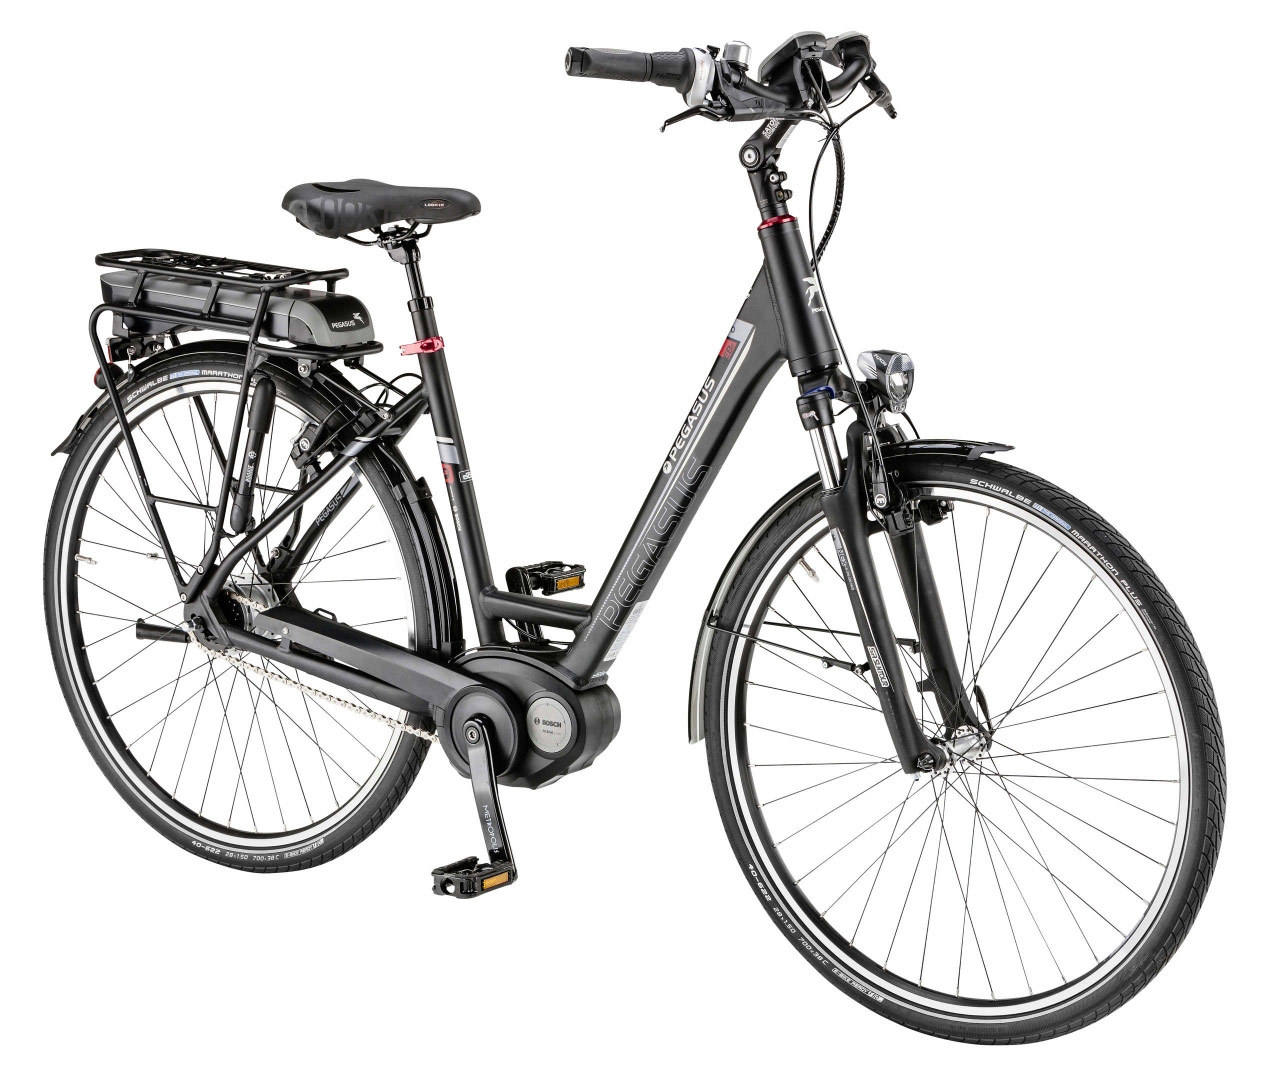 elektro fahrrad pegasus premio e8 f e bike bosch shimano 8g schwarz 50 cm 2015 ebay. Black Bedroom Furniture Sets. Home Design Ideas